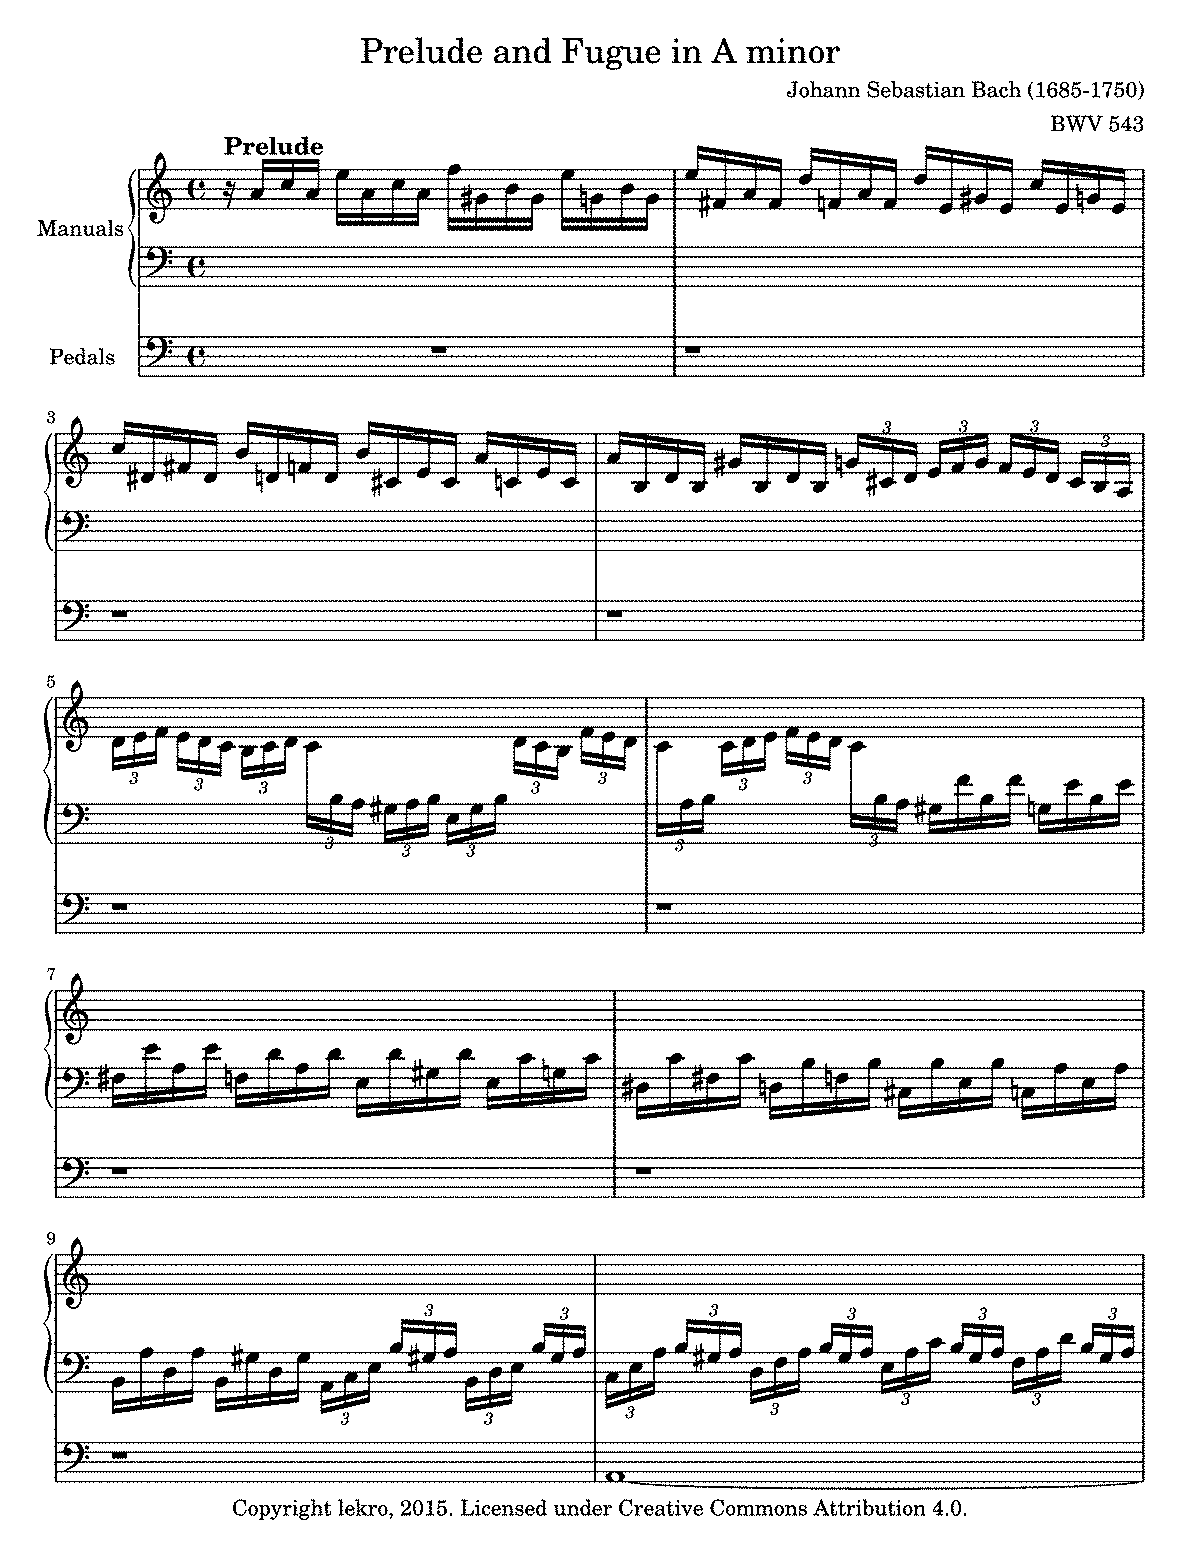 BWV 543